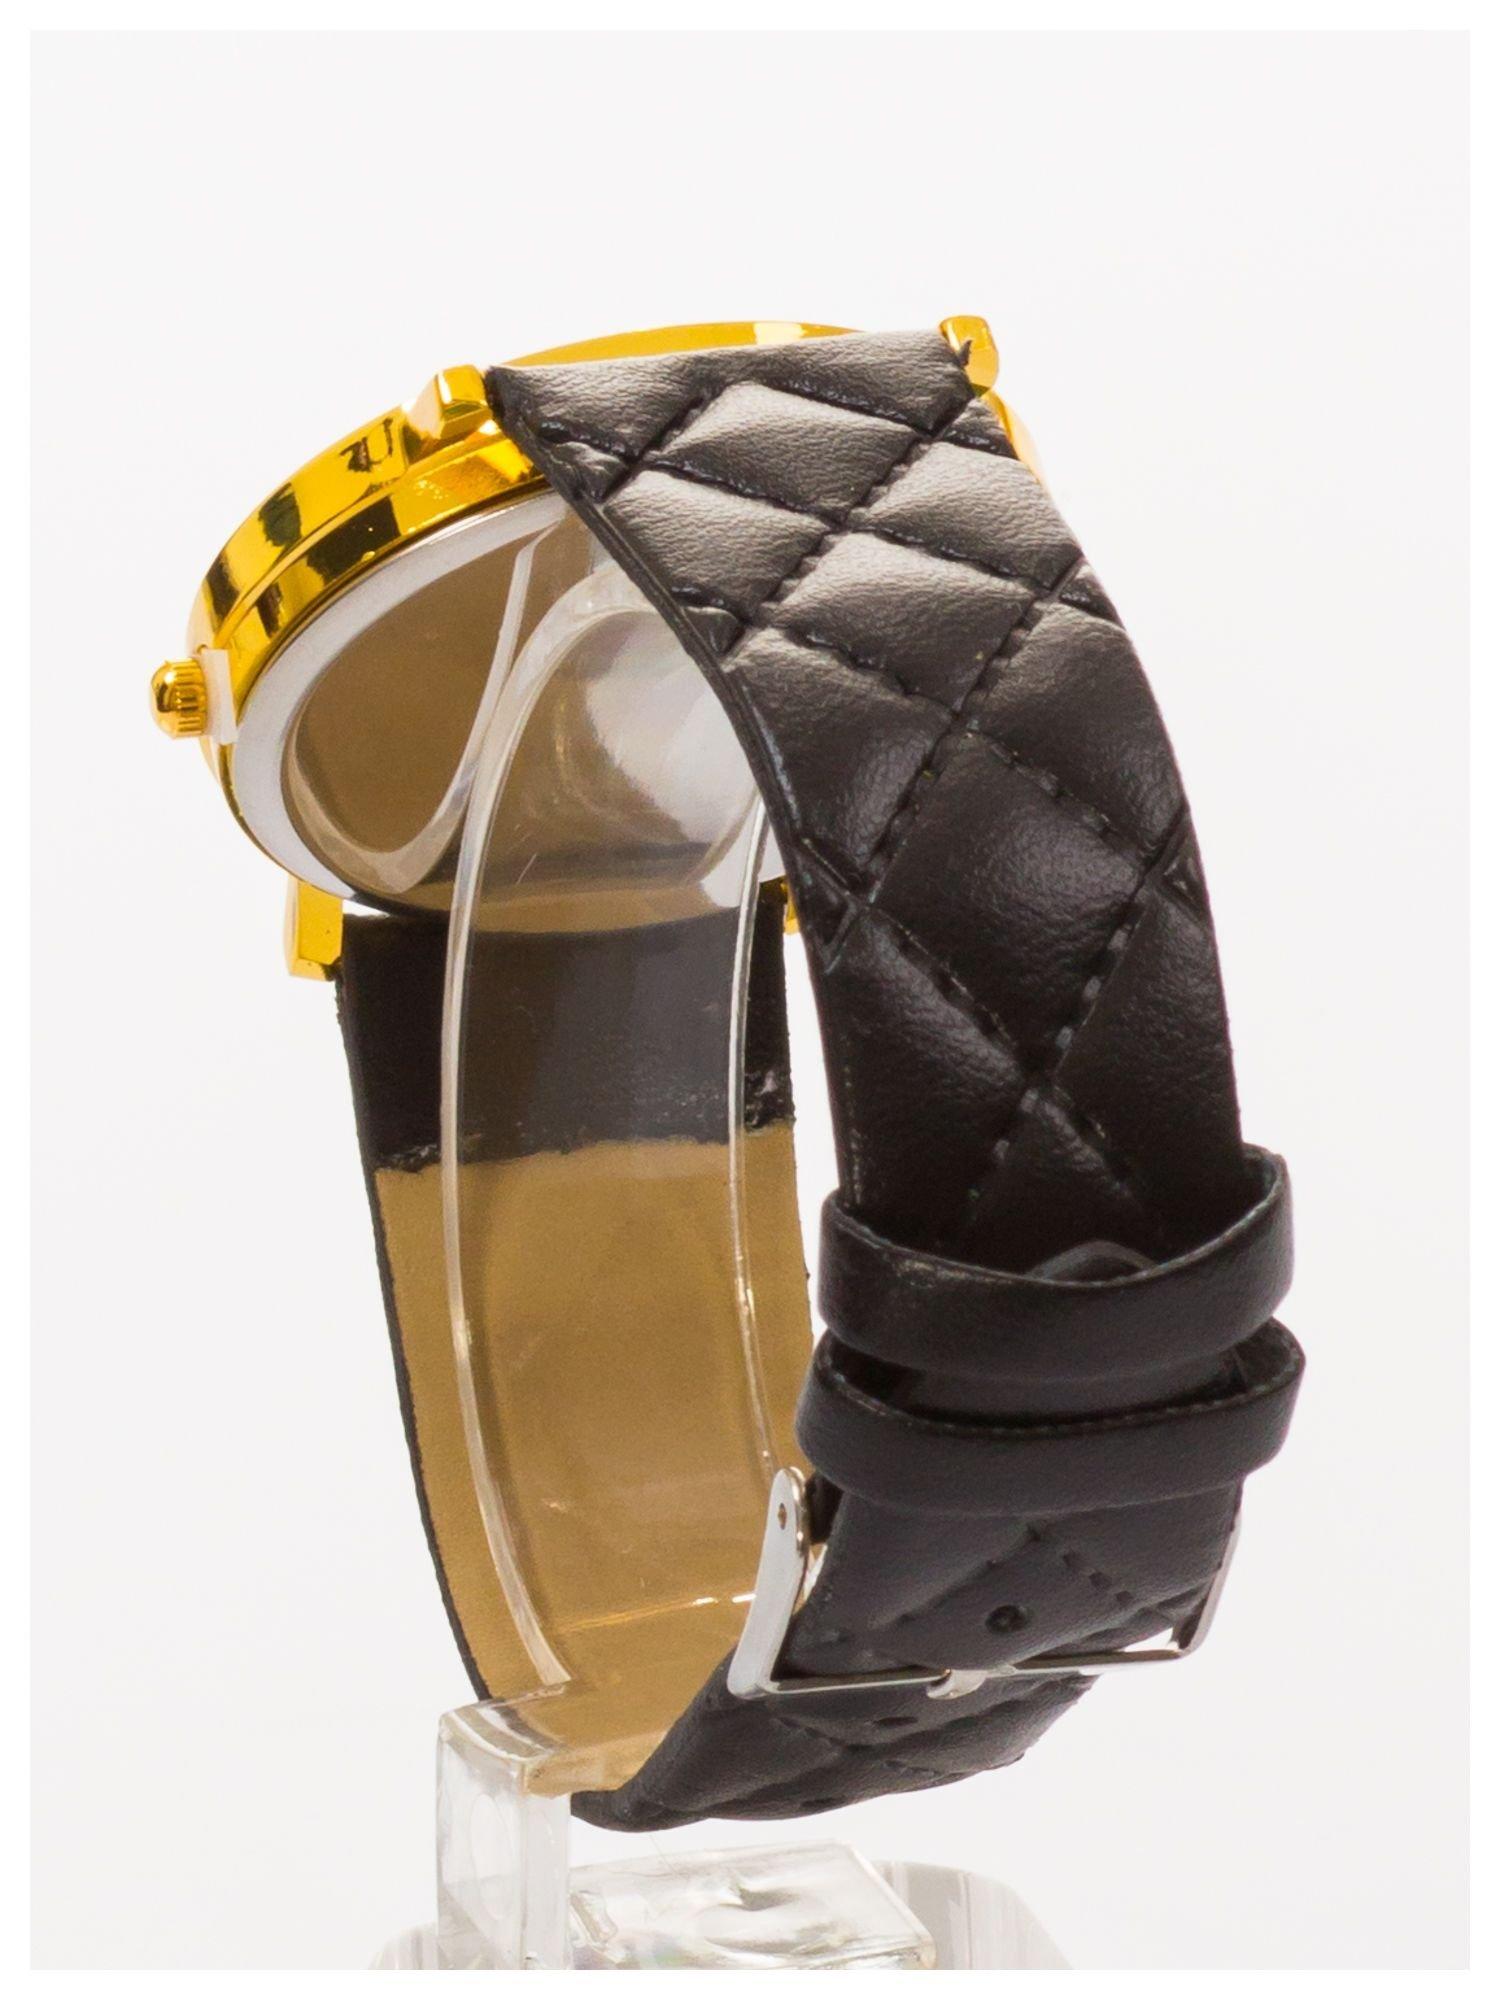 GENEVA Czarny zegarek damski na pikowanym pasku                                  zdj.                                  4